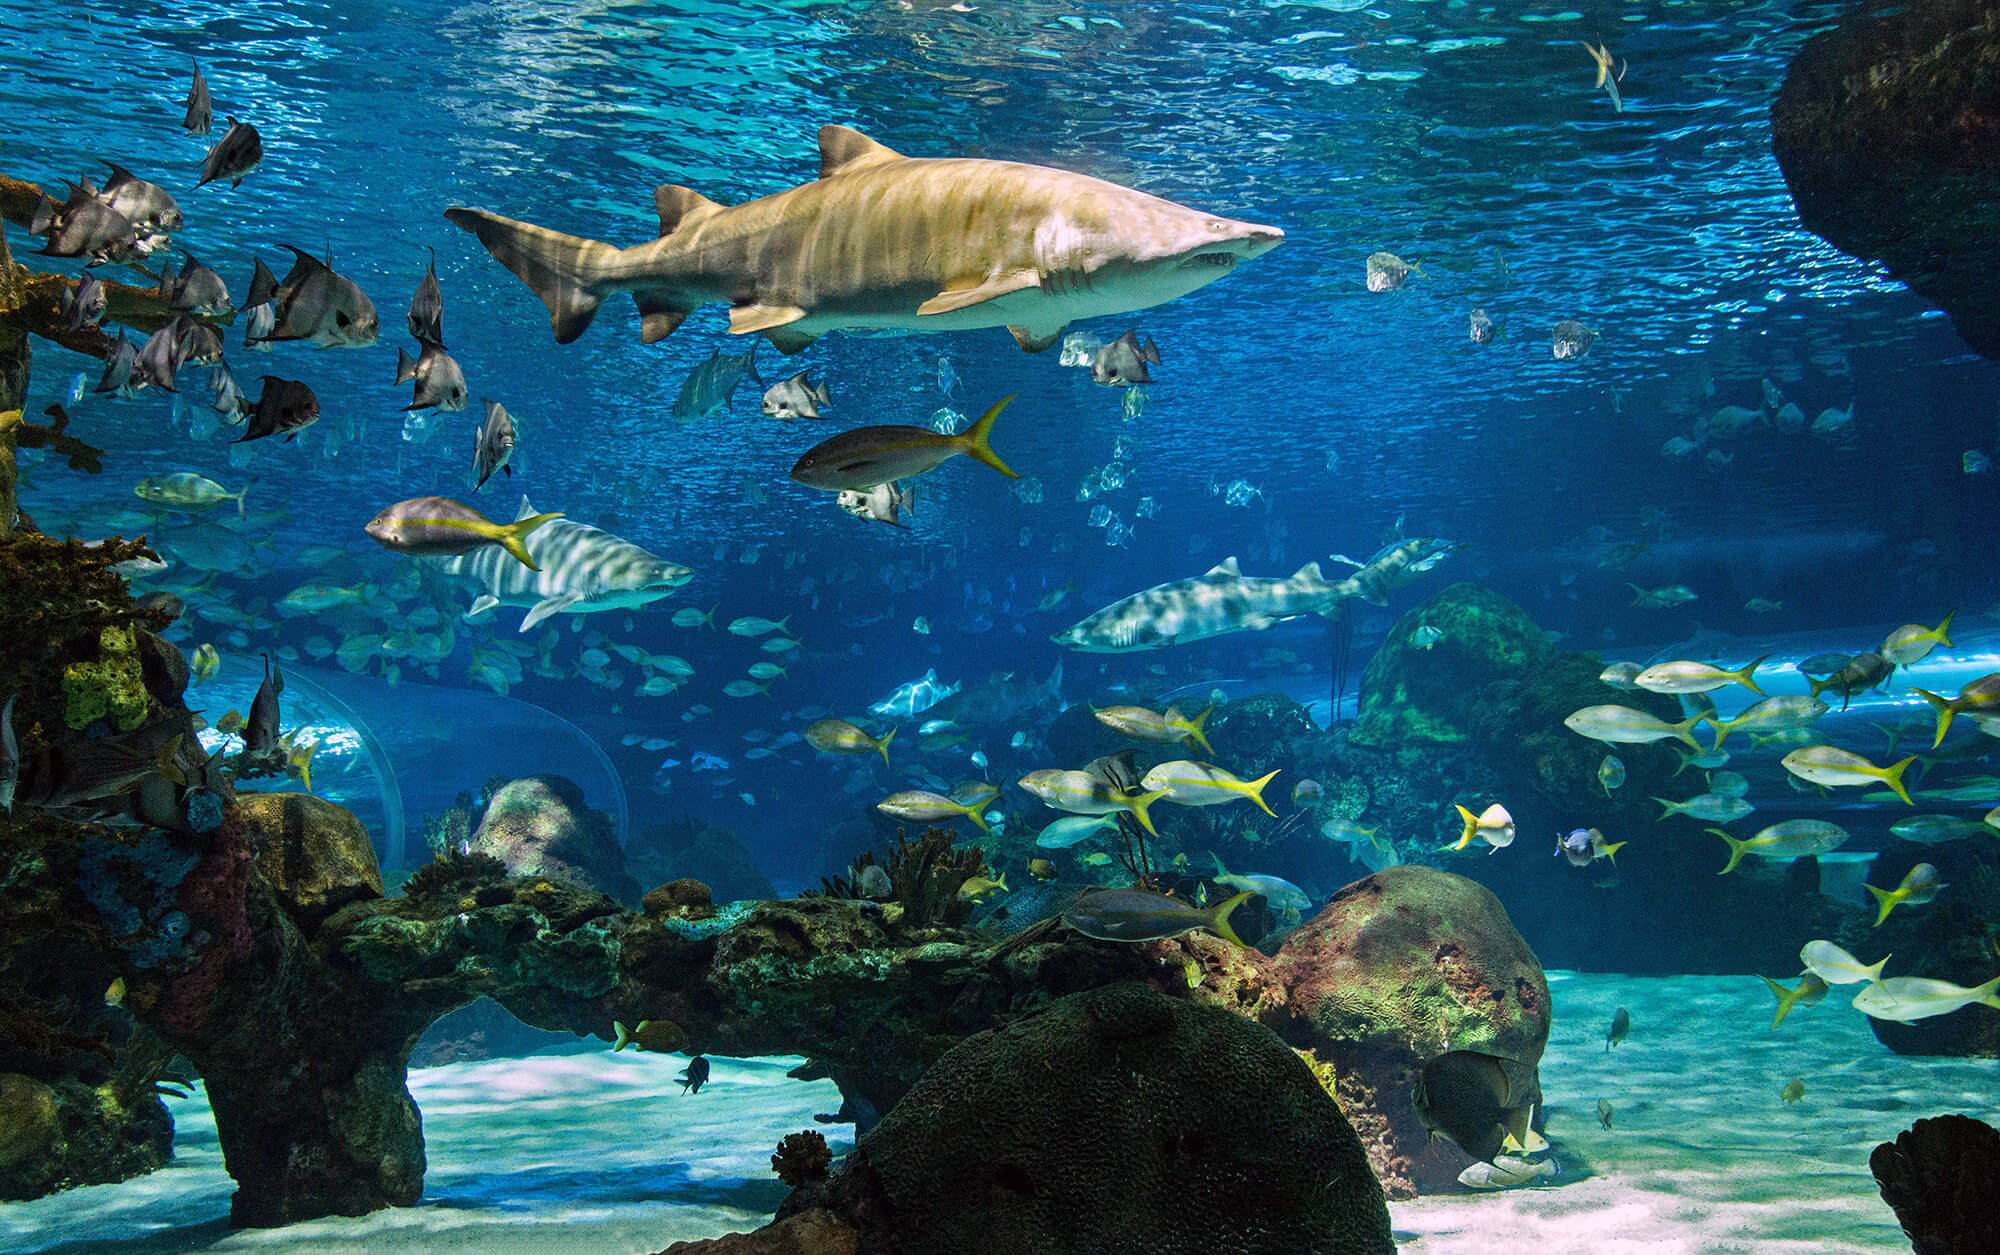 Ripley's Aquarium Of Canada Dangerous Lagoon Tank Overview, Scuba Diving Canada